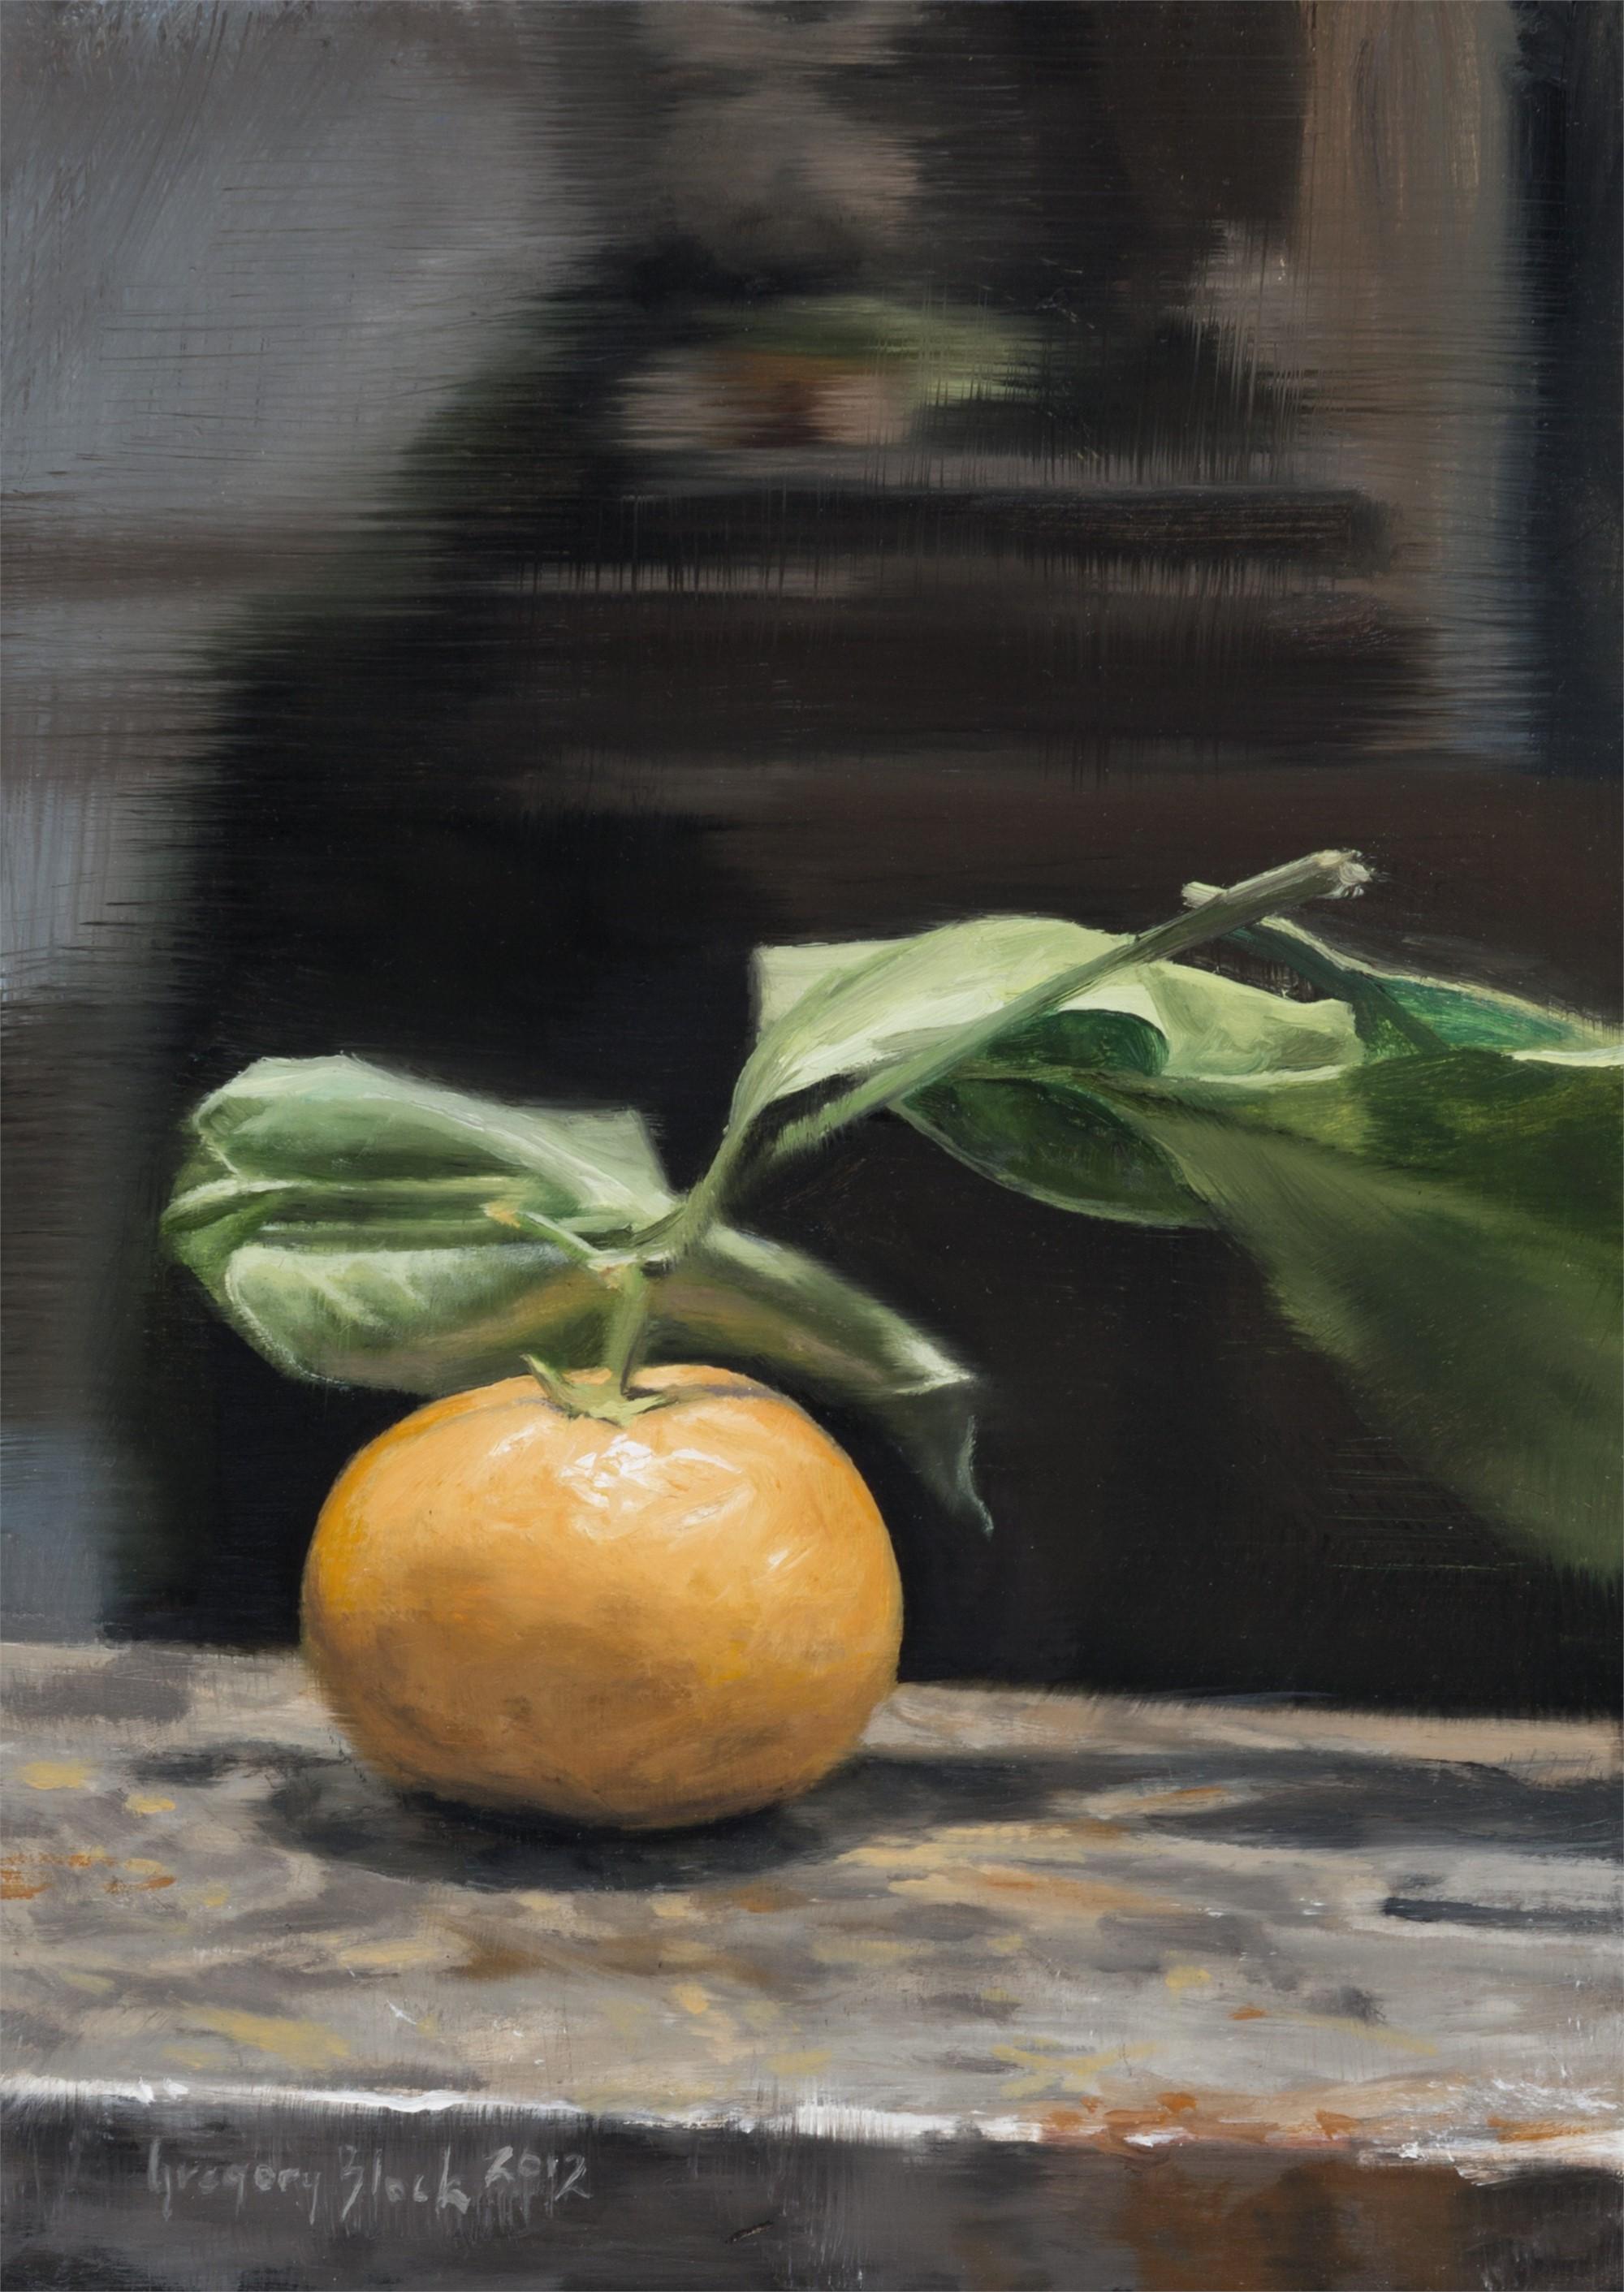 Tangerine by Gregory Block